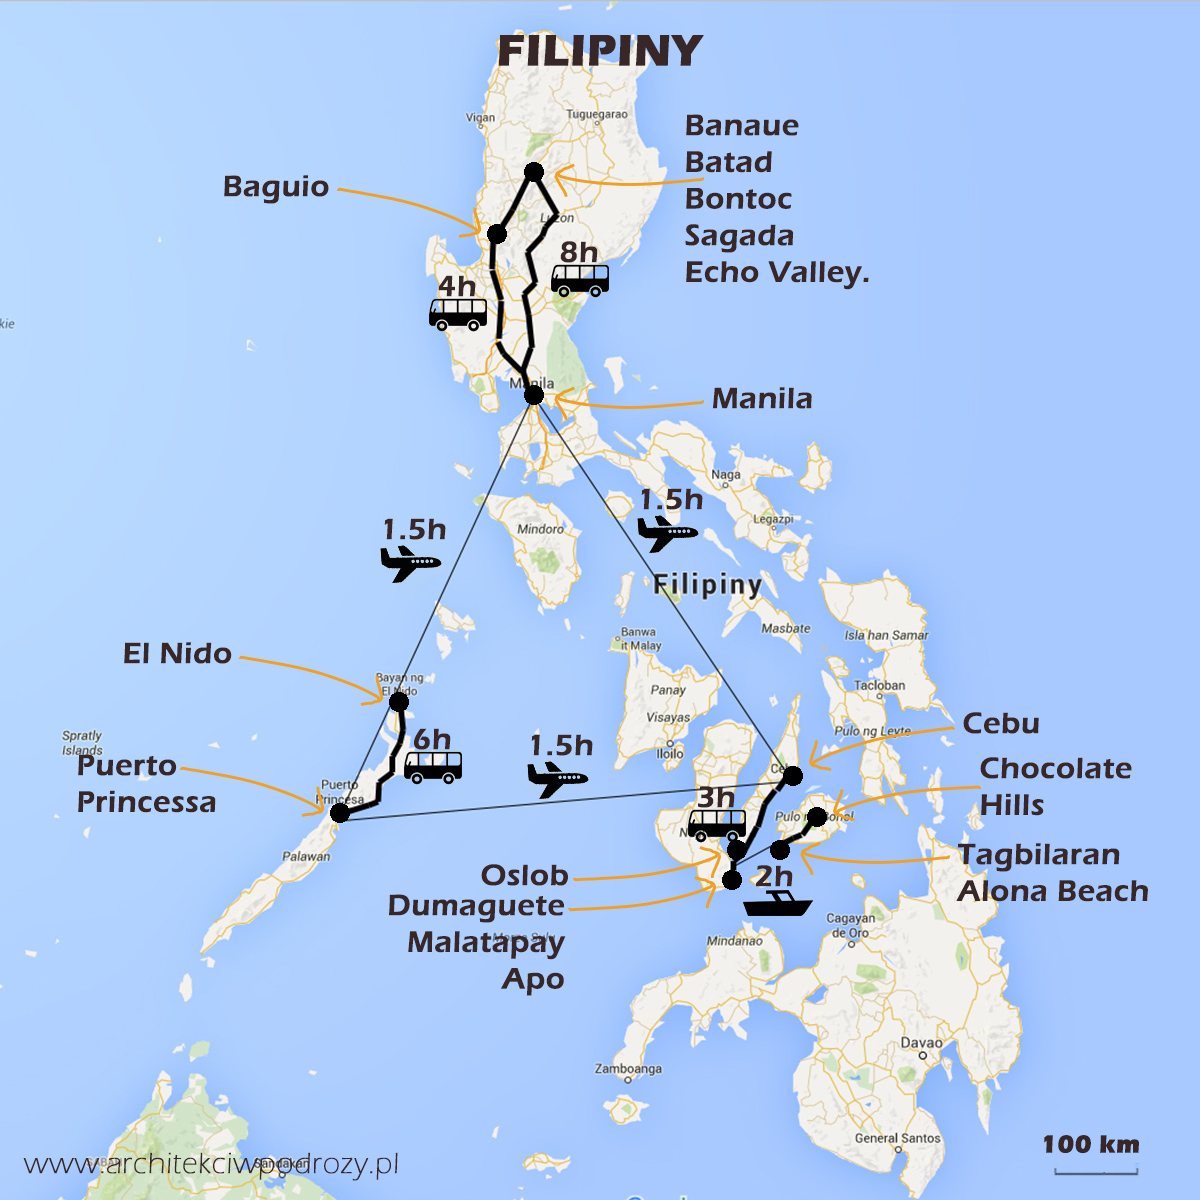 01 FILIPINY mapa - Filipiny - informacje ogólne